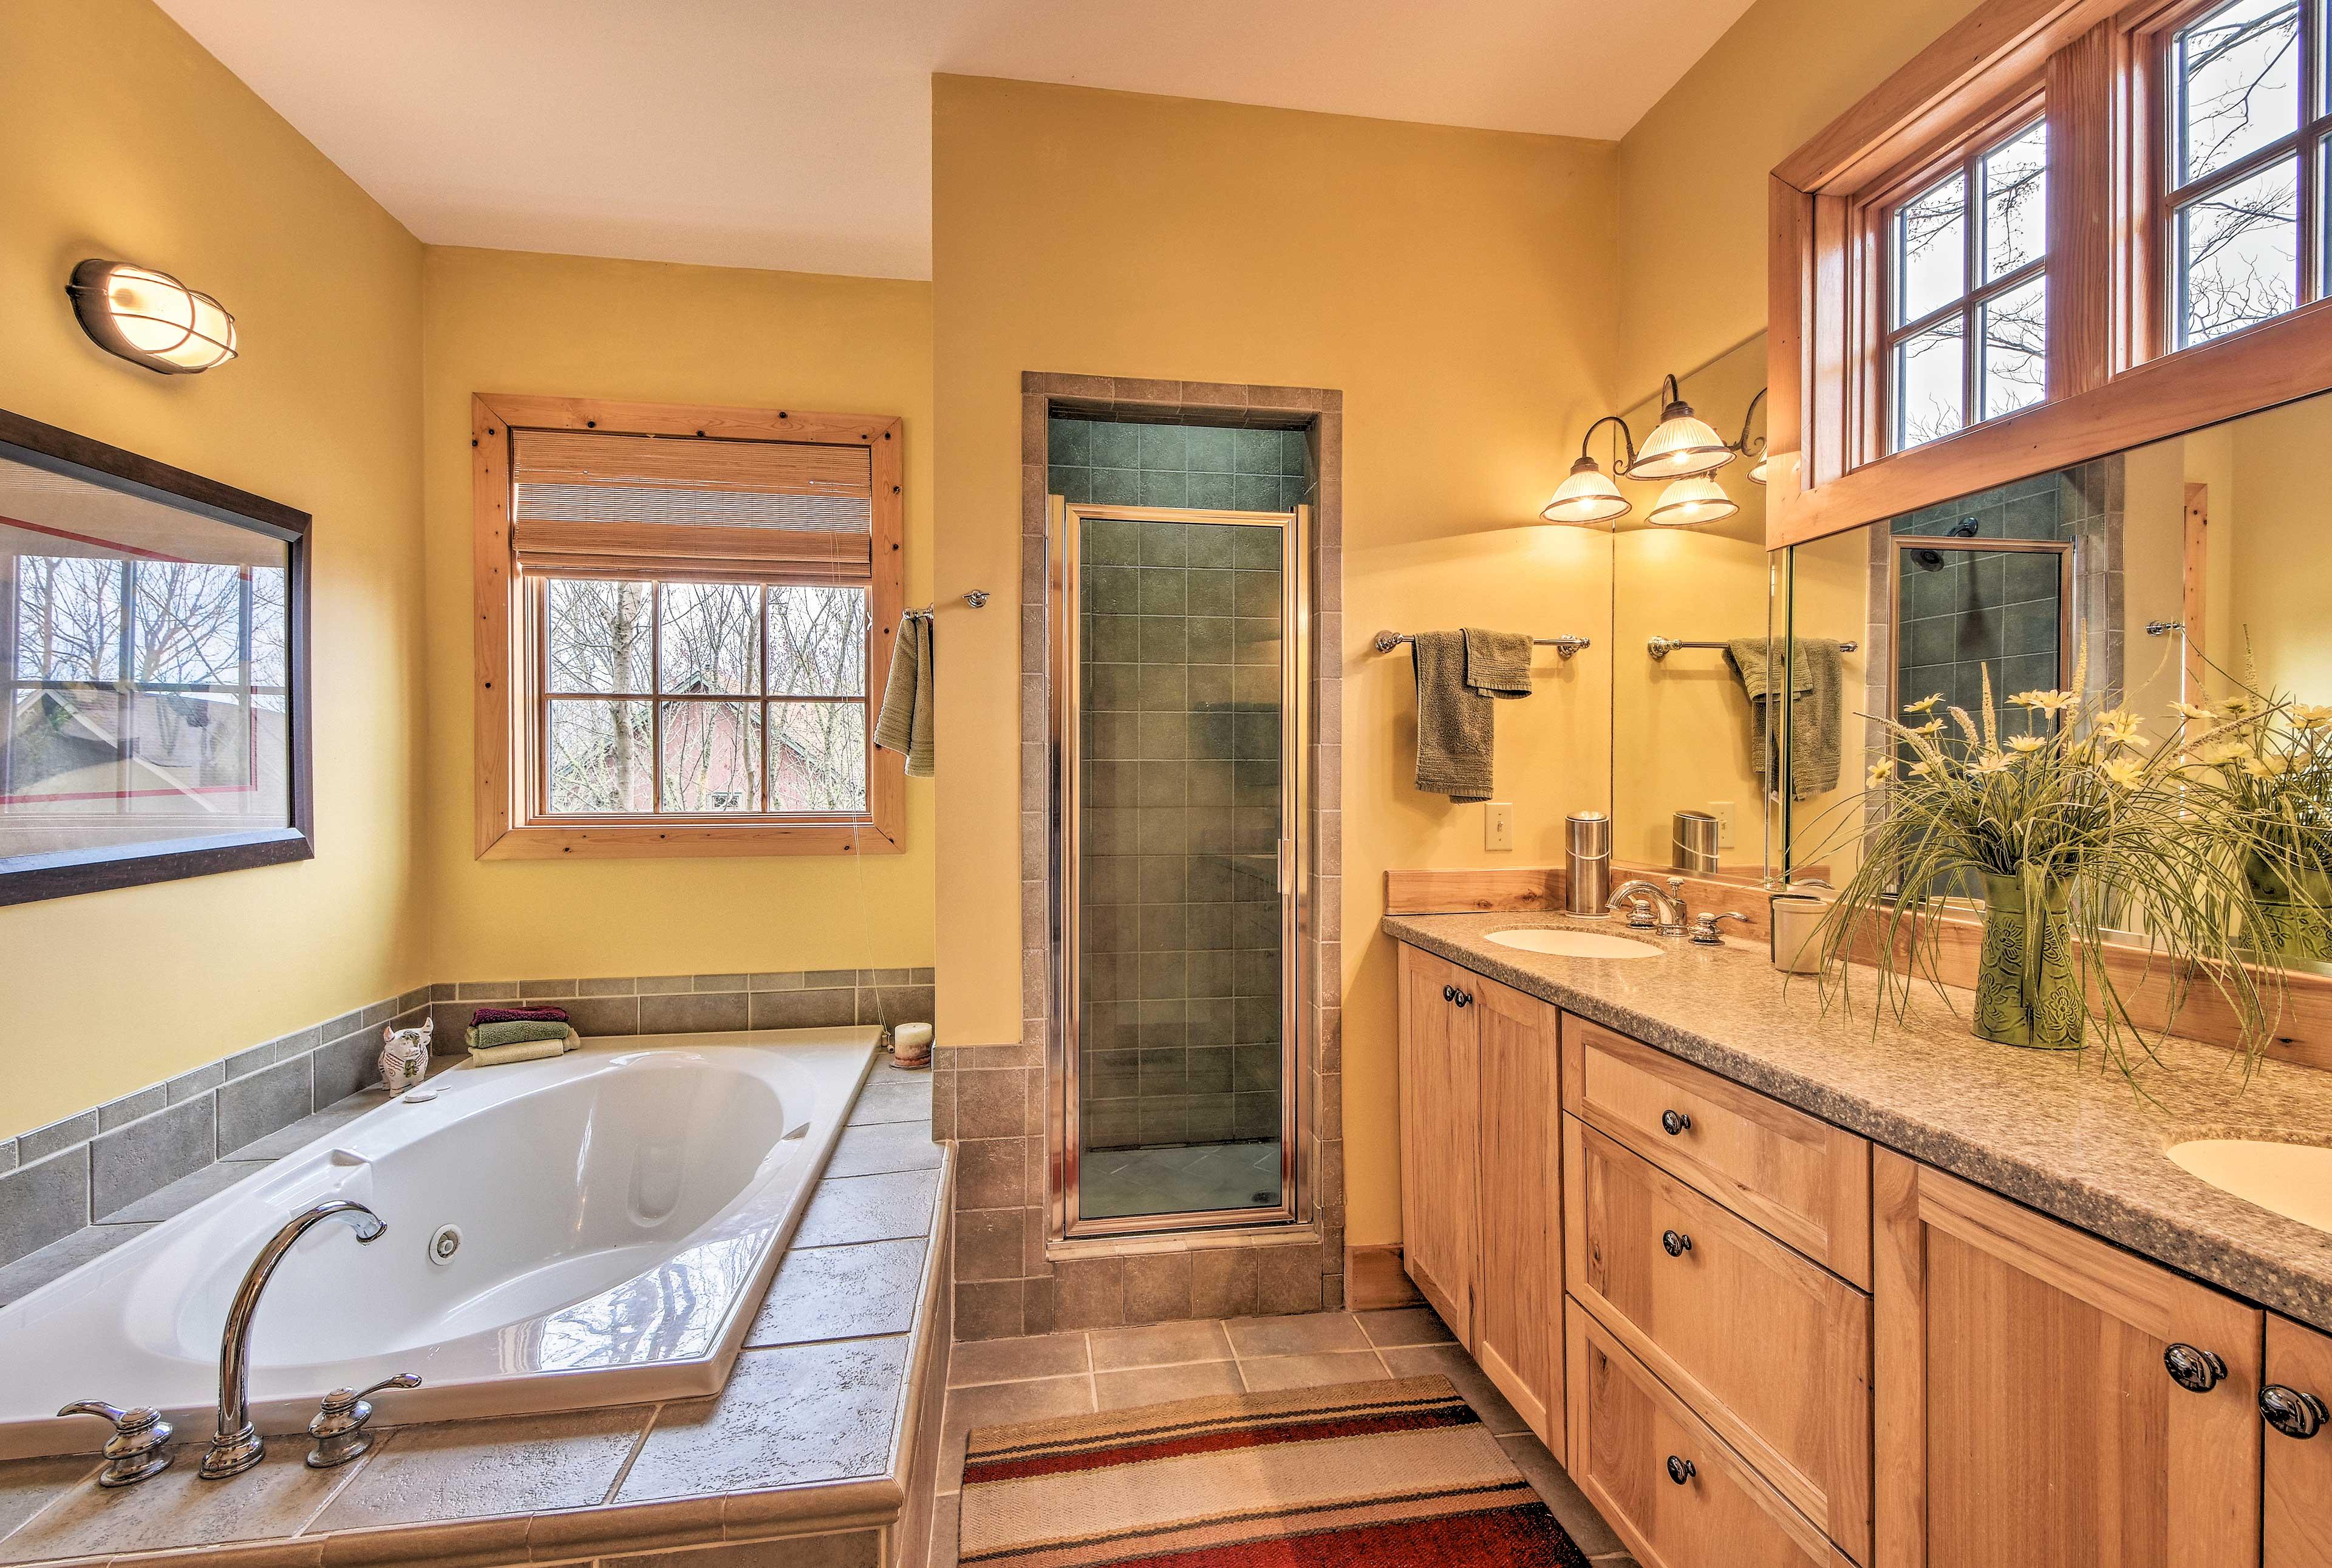 Full Bathroom 1 | Towels Provided